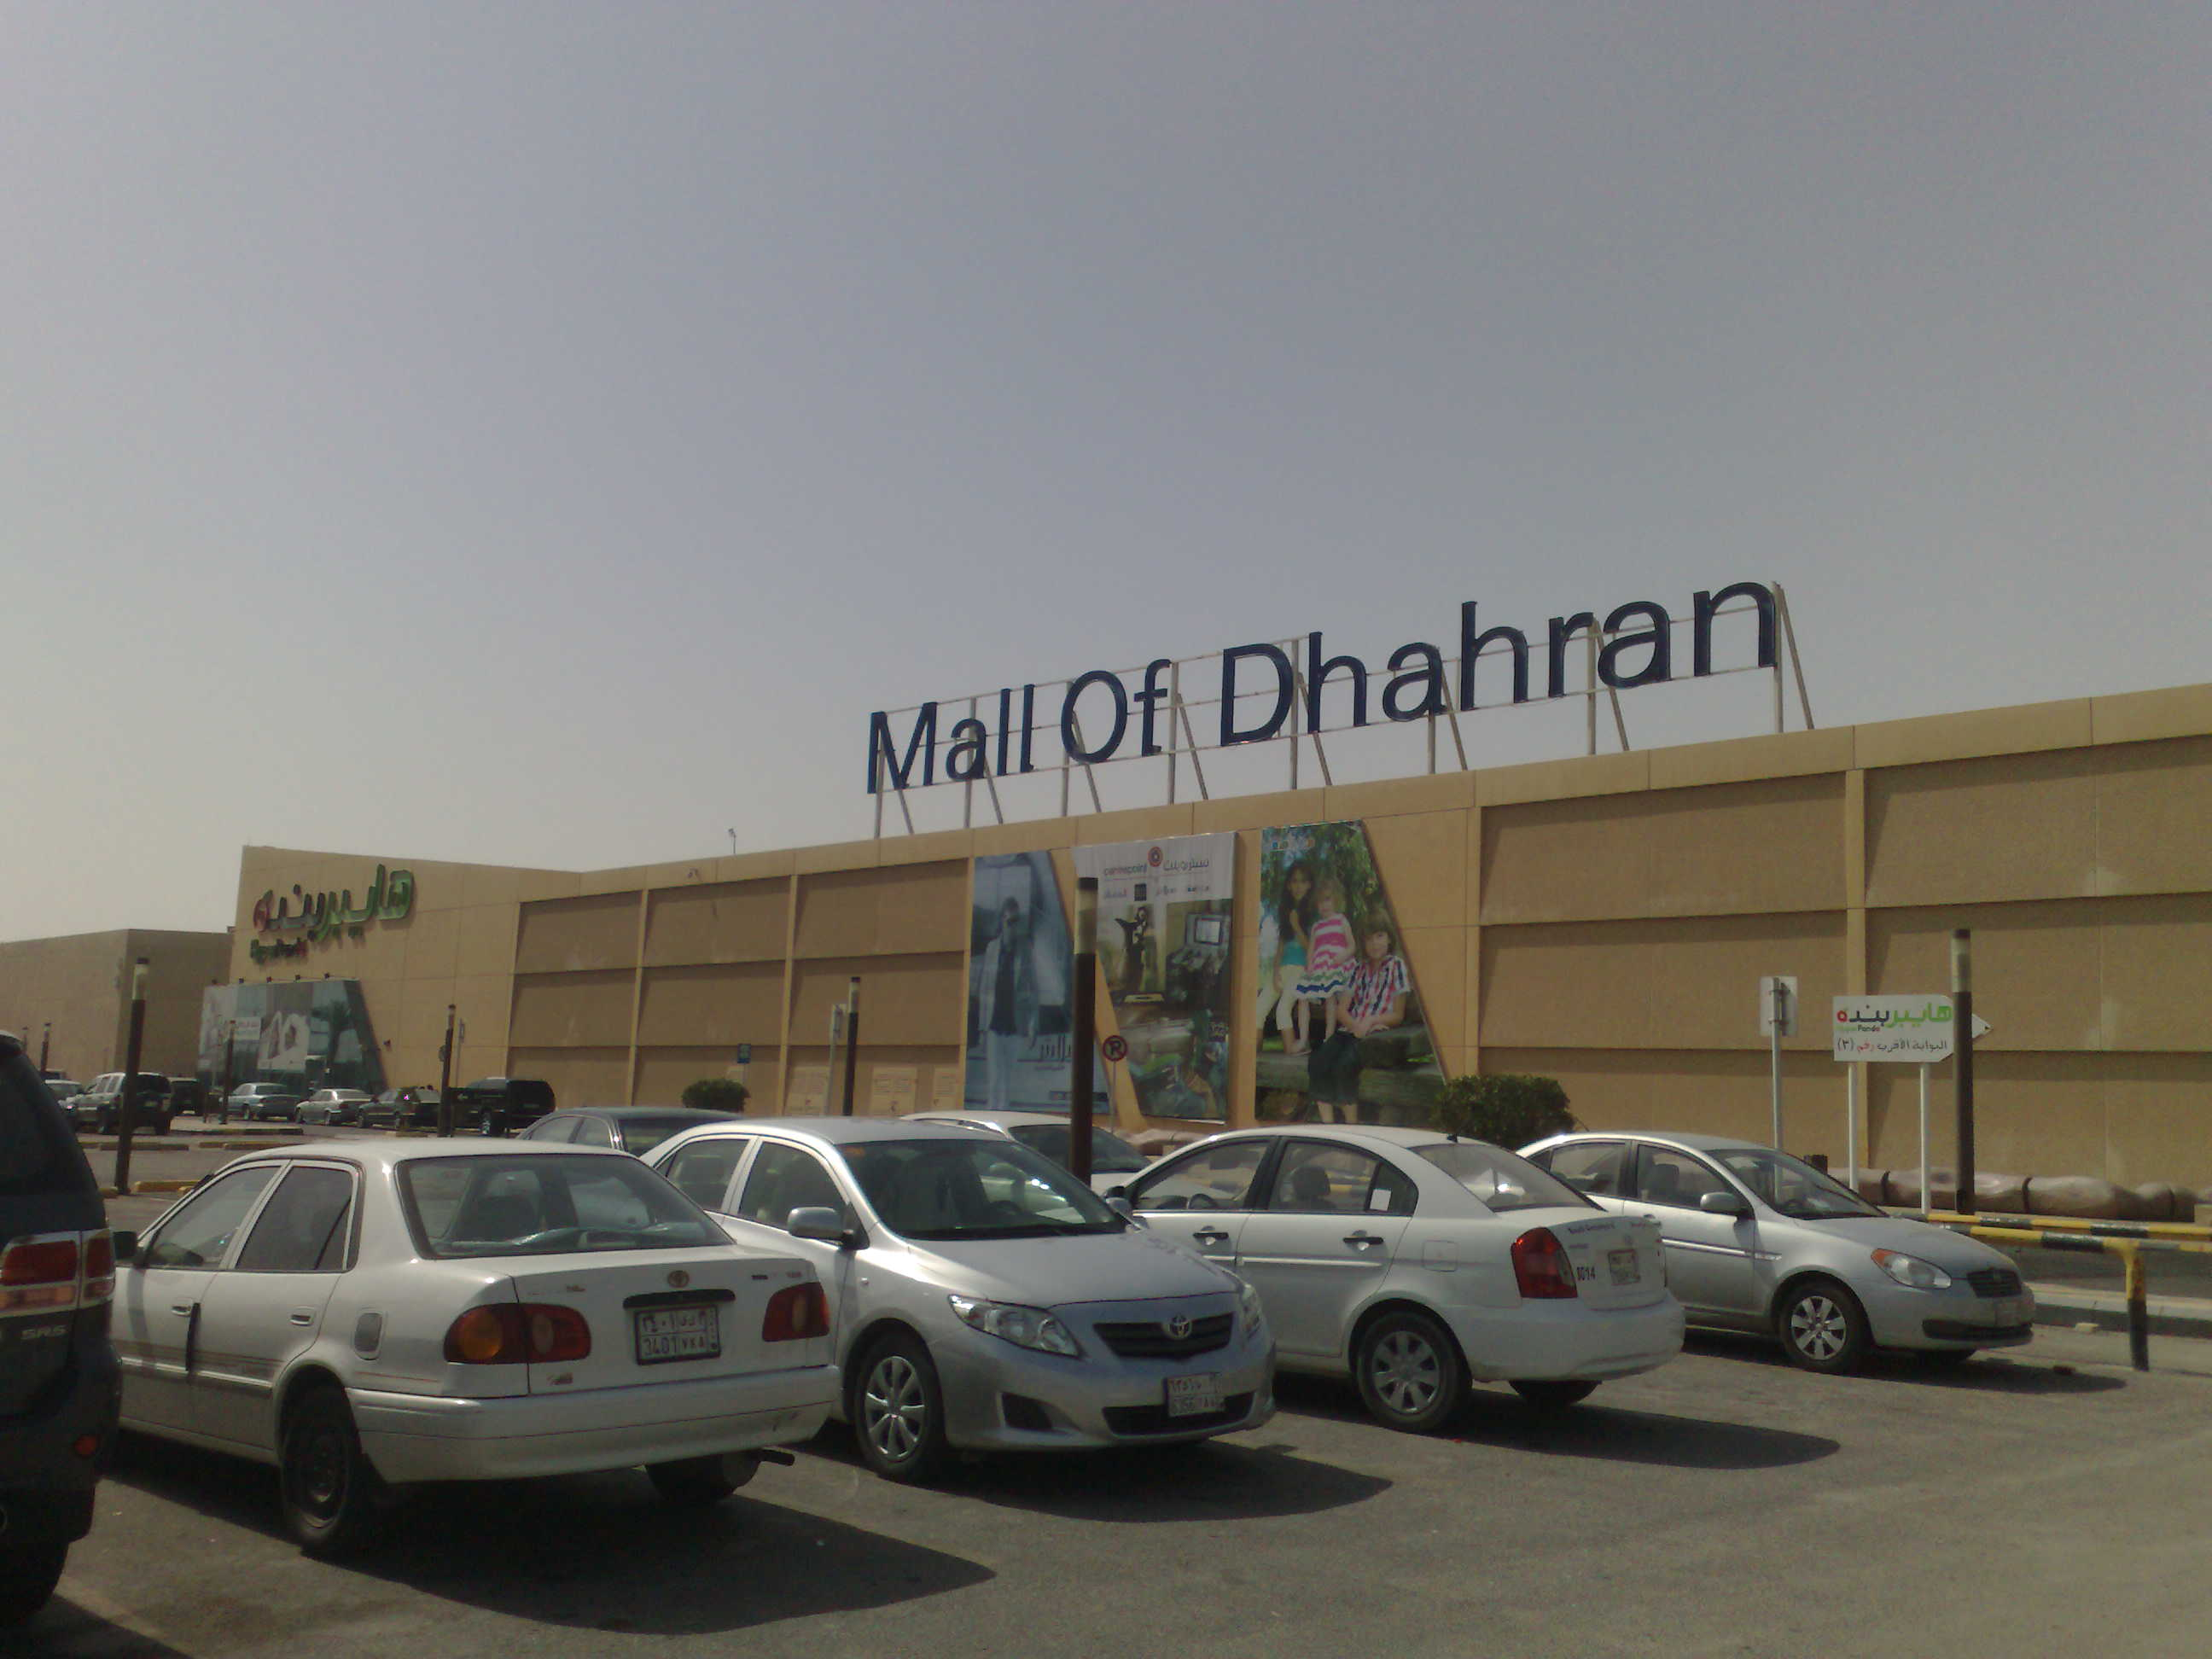 Dhahran Saudi Arabia  city photos gallery : Mall Of Dhahran en Dhahran, Saudi Arabia